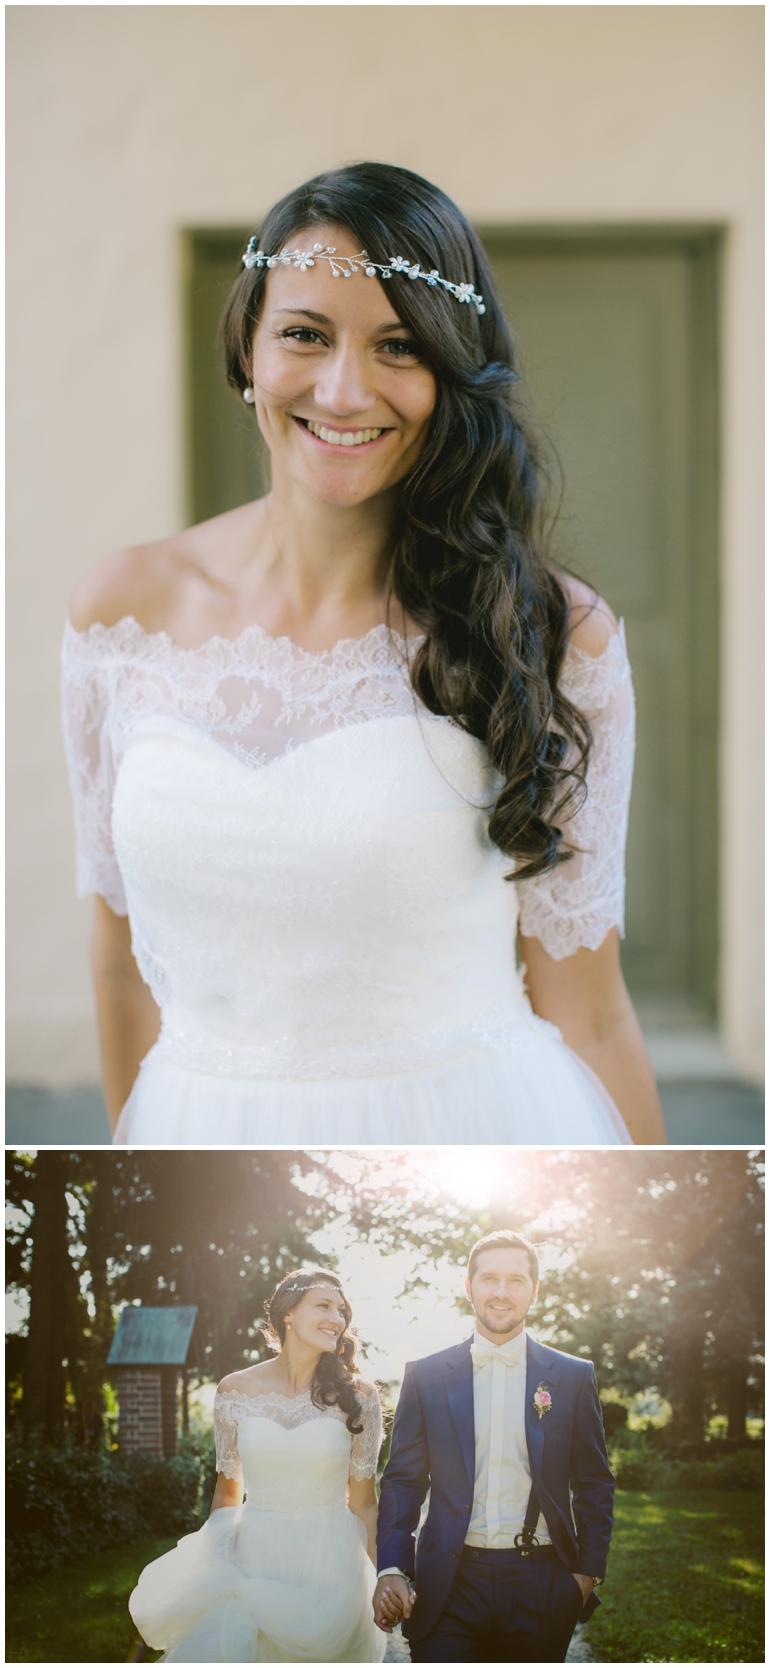 MelanieHoeld_wedding2015_0017